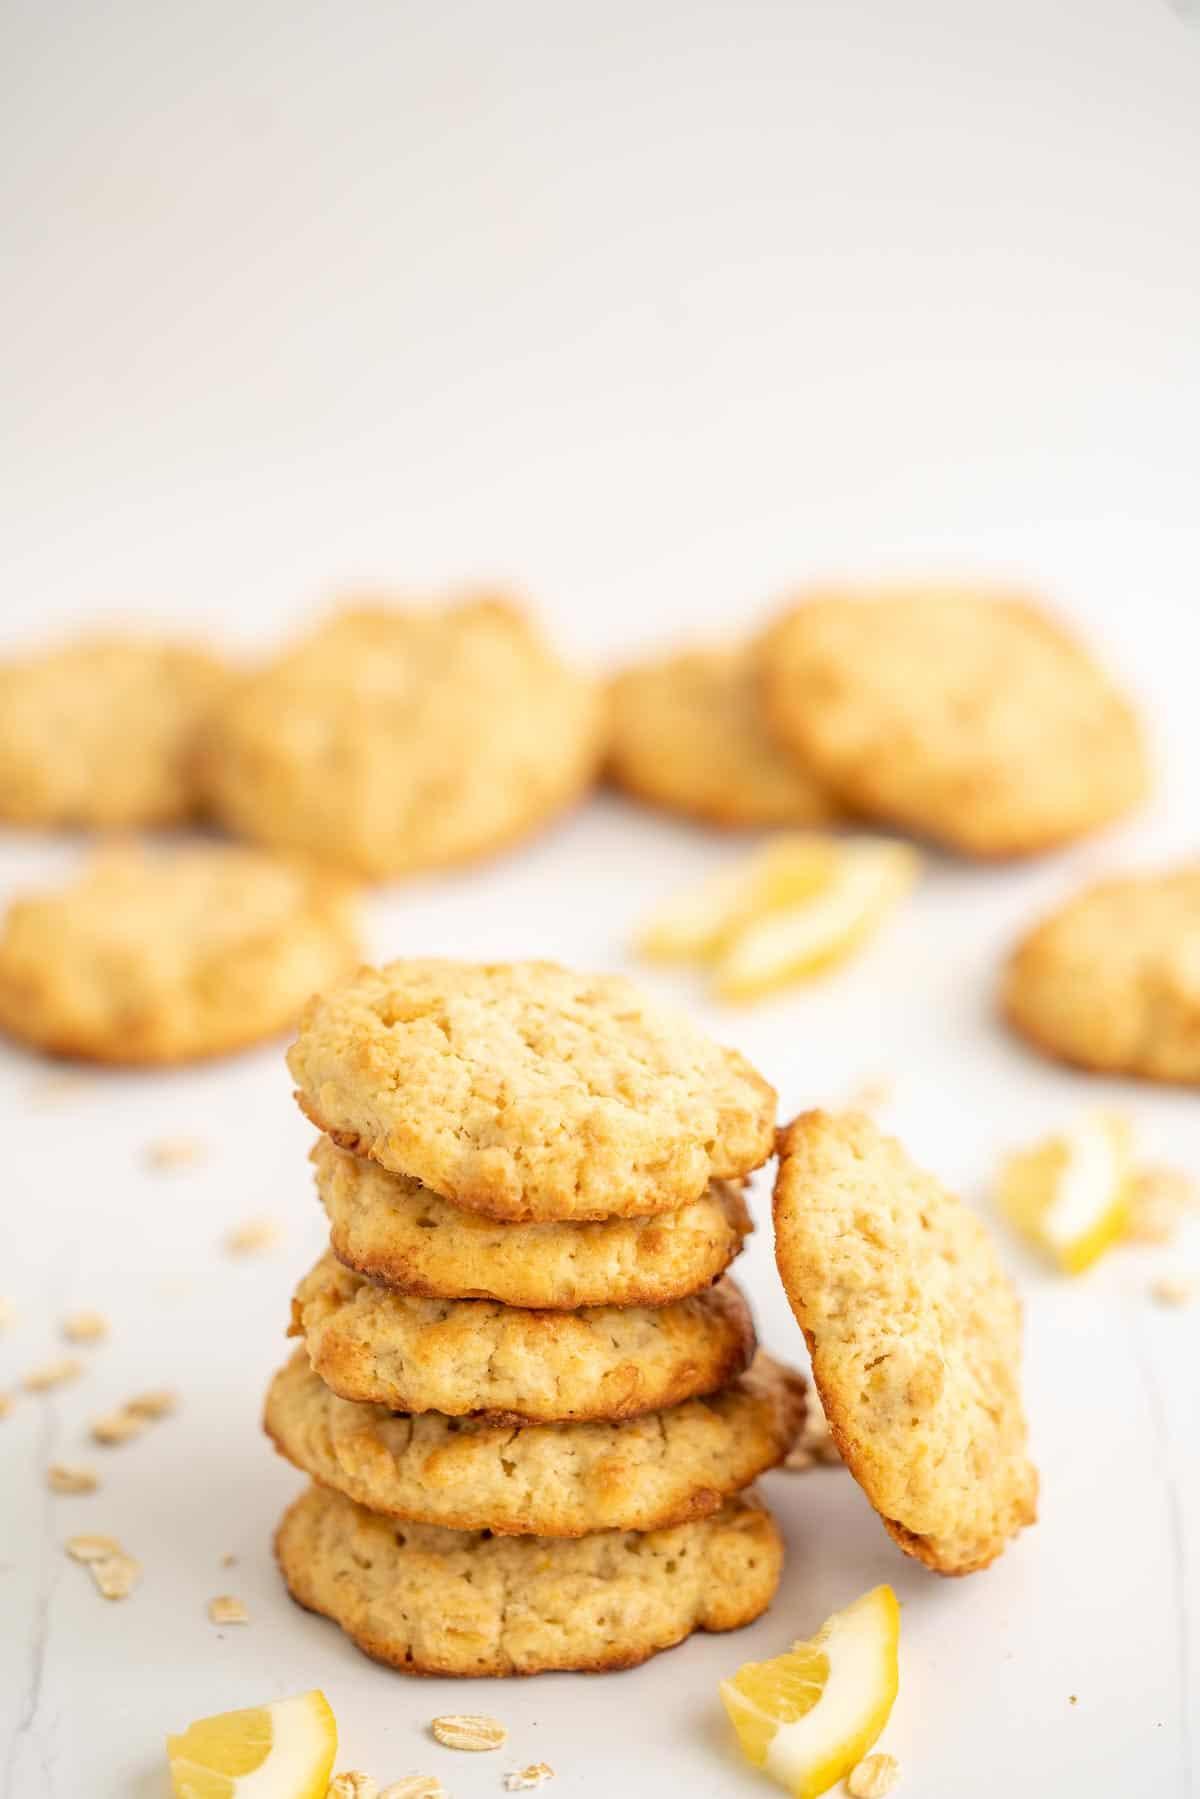 A stack of 5 lemon oatmeal cookies.